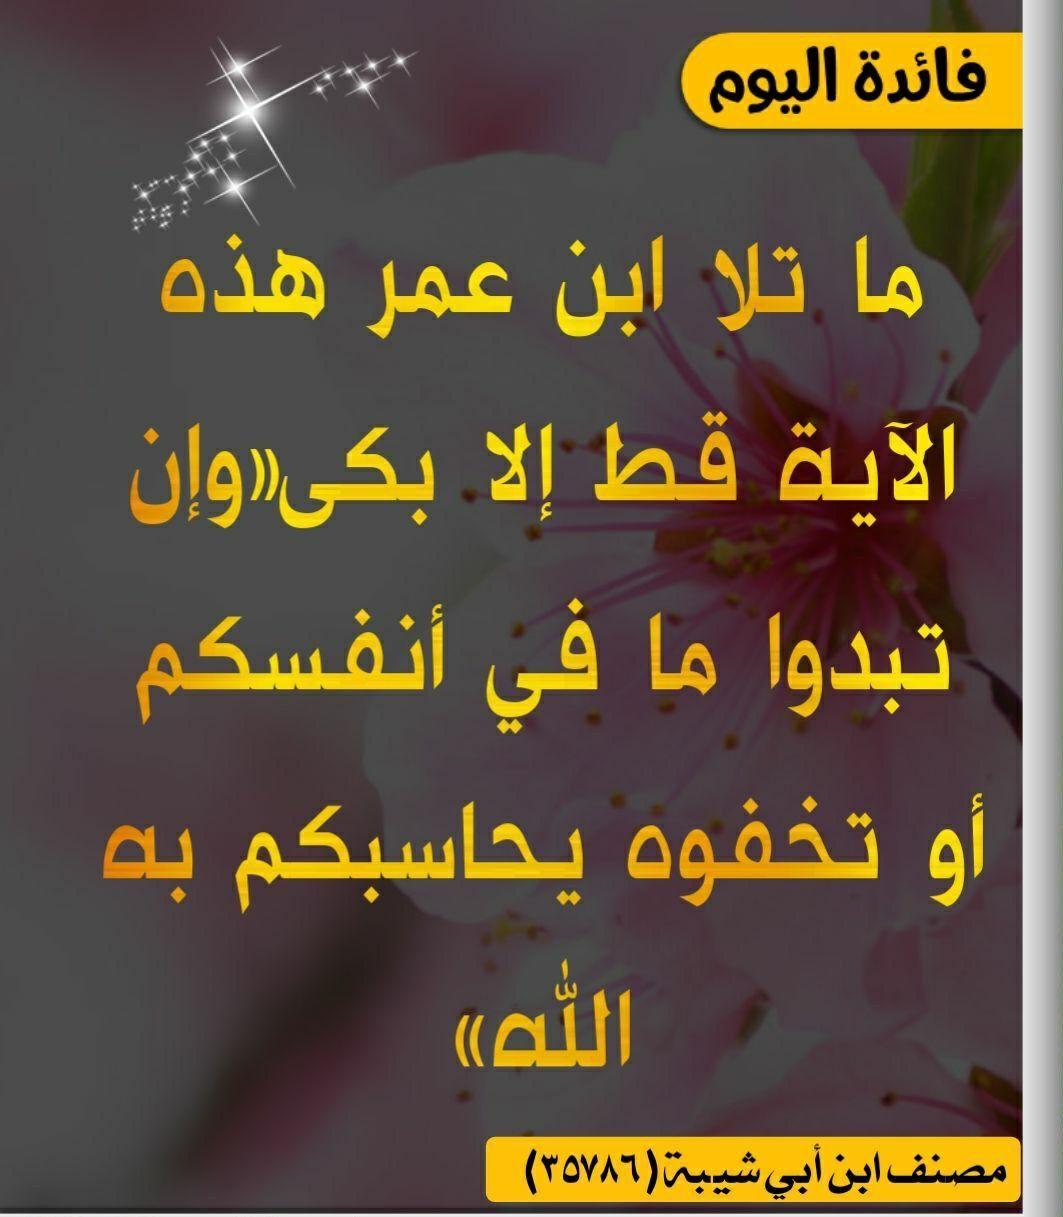 Pin By الأثر الجميل On أقوال الصحابة والعلماء Islam Movie Posters Arabic Calligraphy